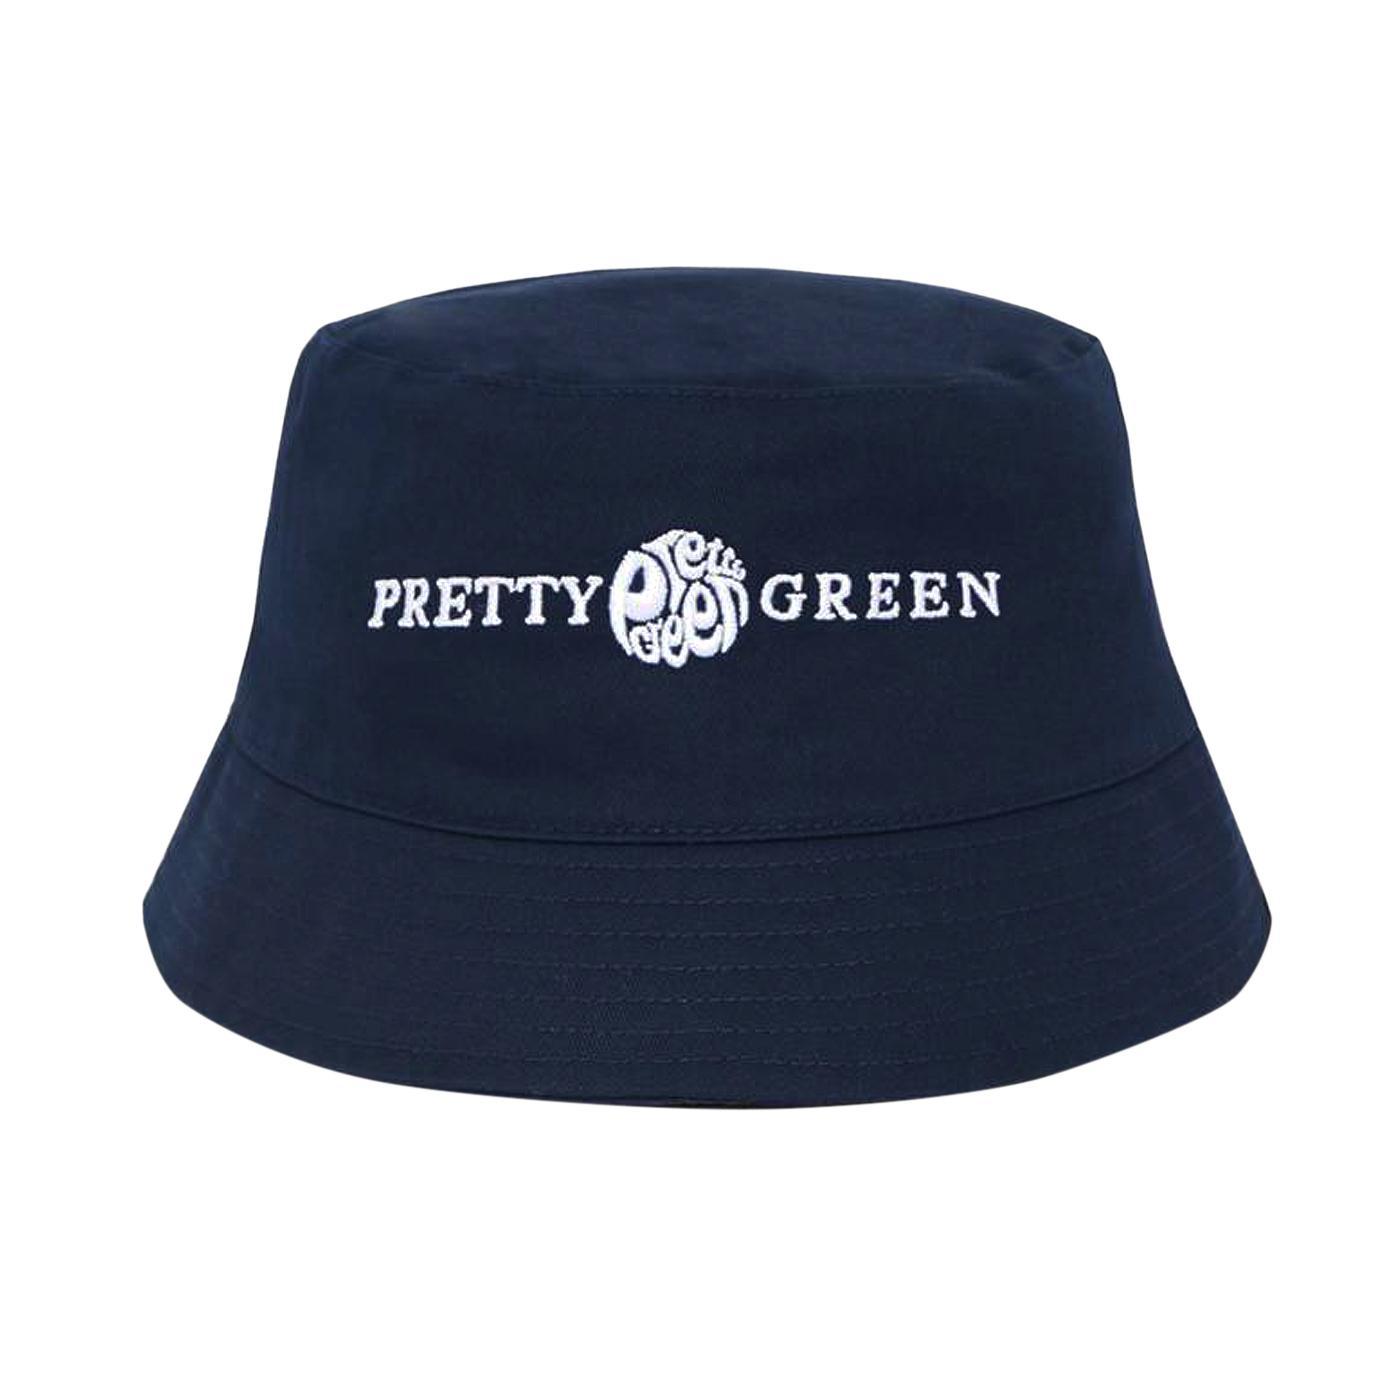 PRETTY GREEN Retro 90s Logo Bucket Hat (Navy)